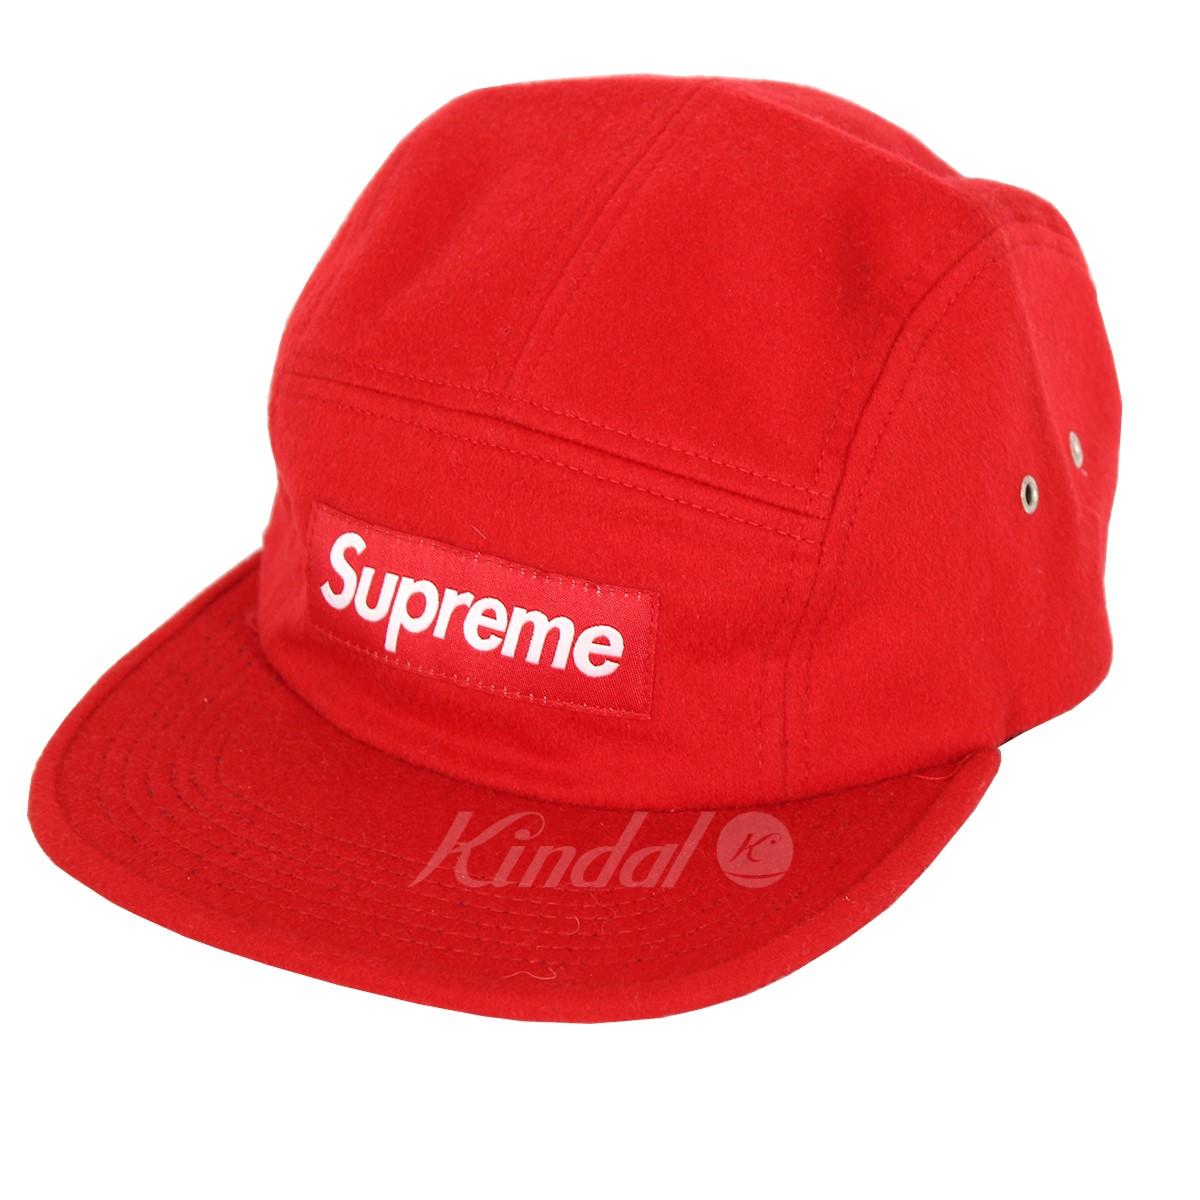 4e3080c8742 kindal  SUPREME 17AW Loro Piana Wool Camp Cap box logo cap red ...